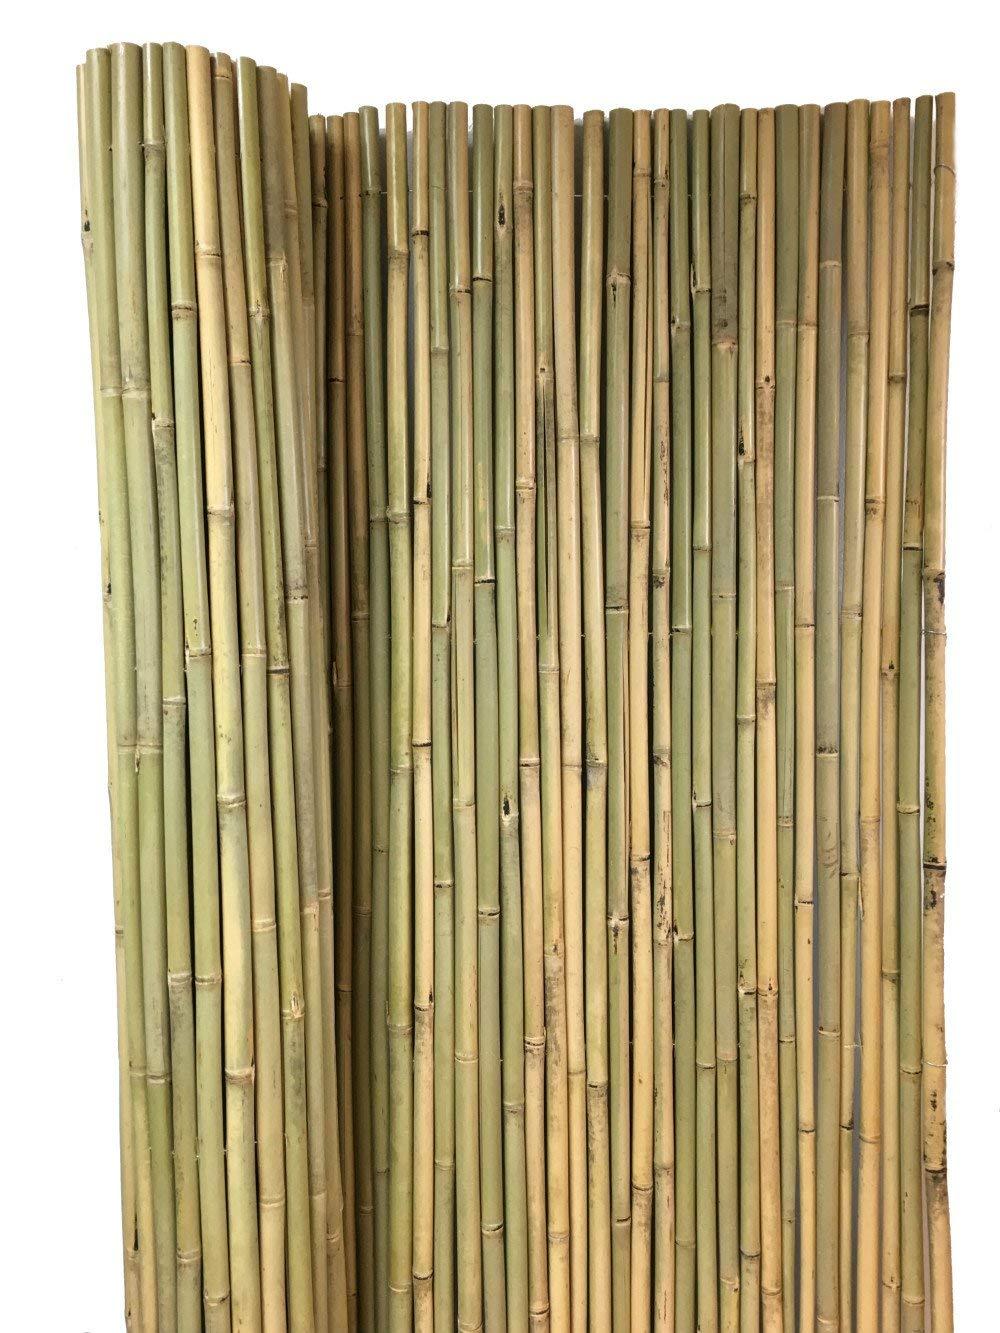 Tonkin Bamboo Fence, 3/4'' Diameter Poles, 8'L x 4'H, BWF-48